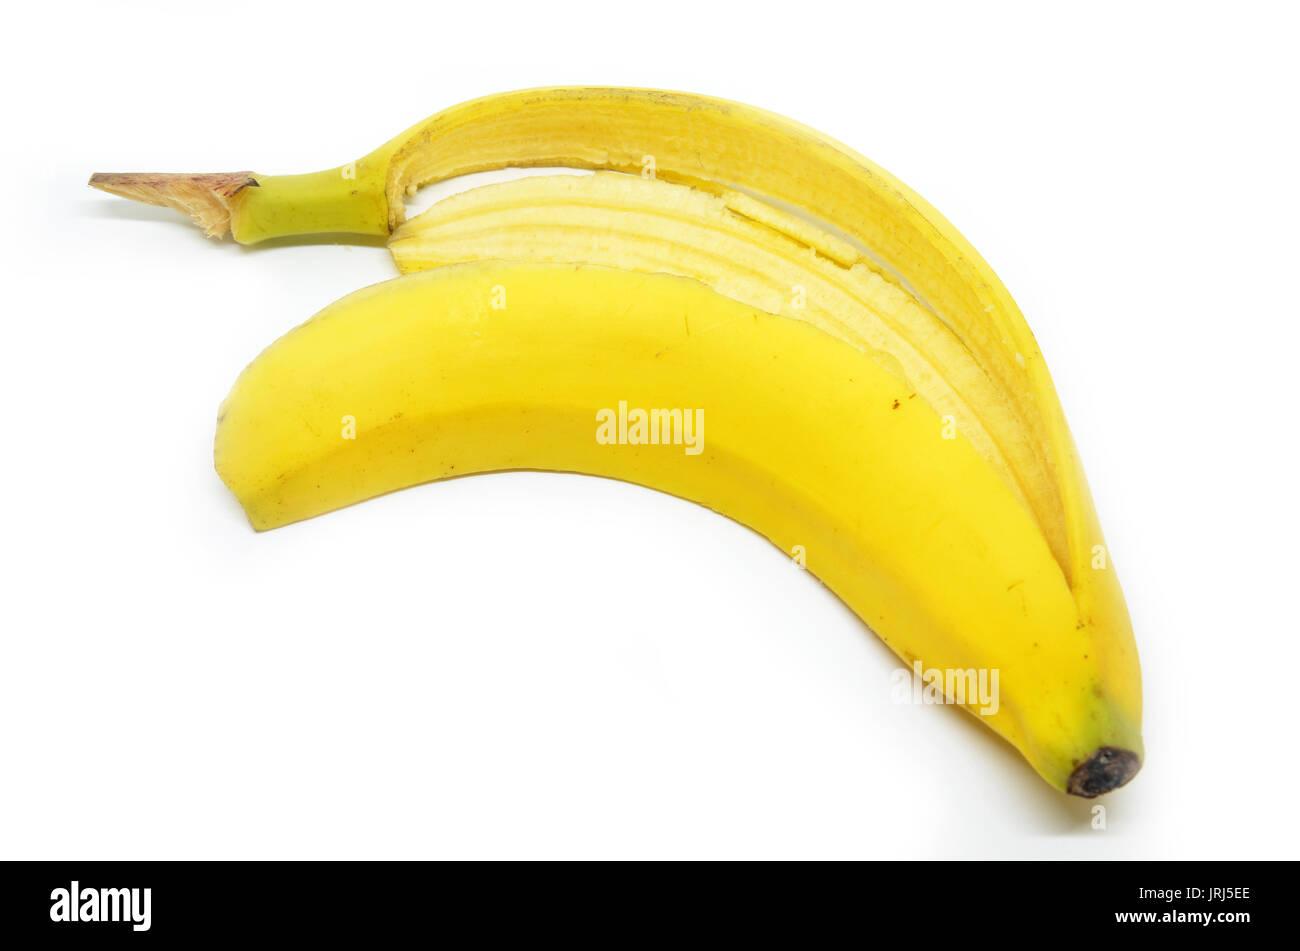 Slippery banana skin on a white background - Stock Image